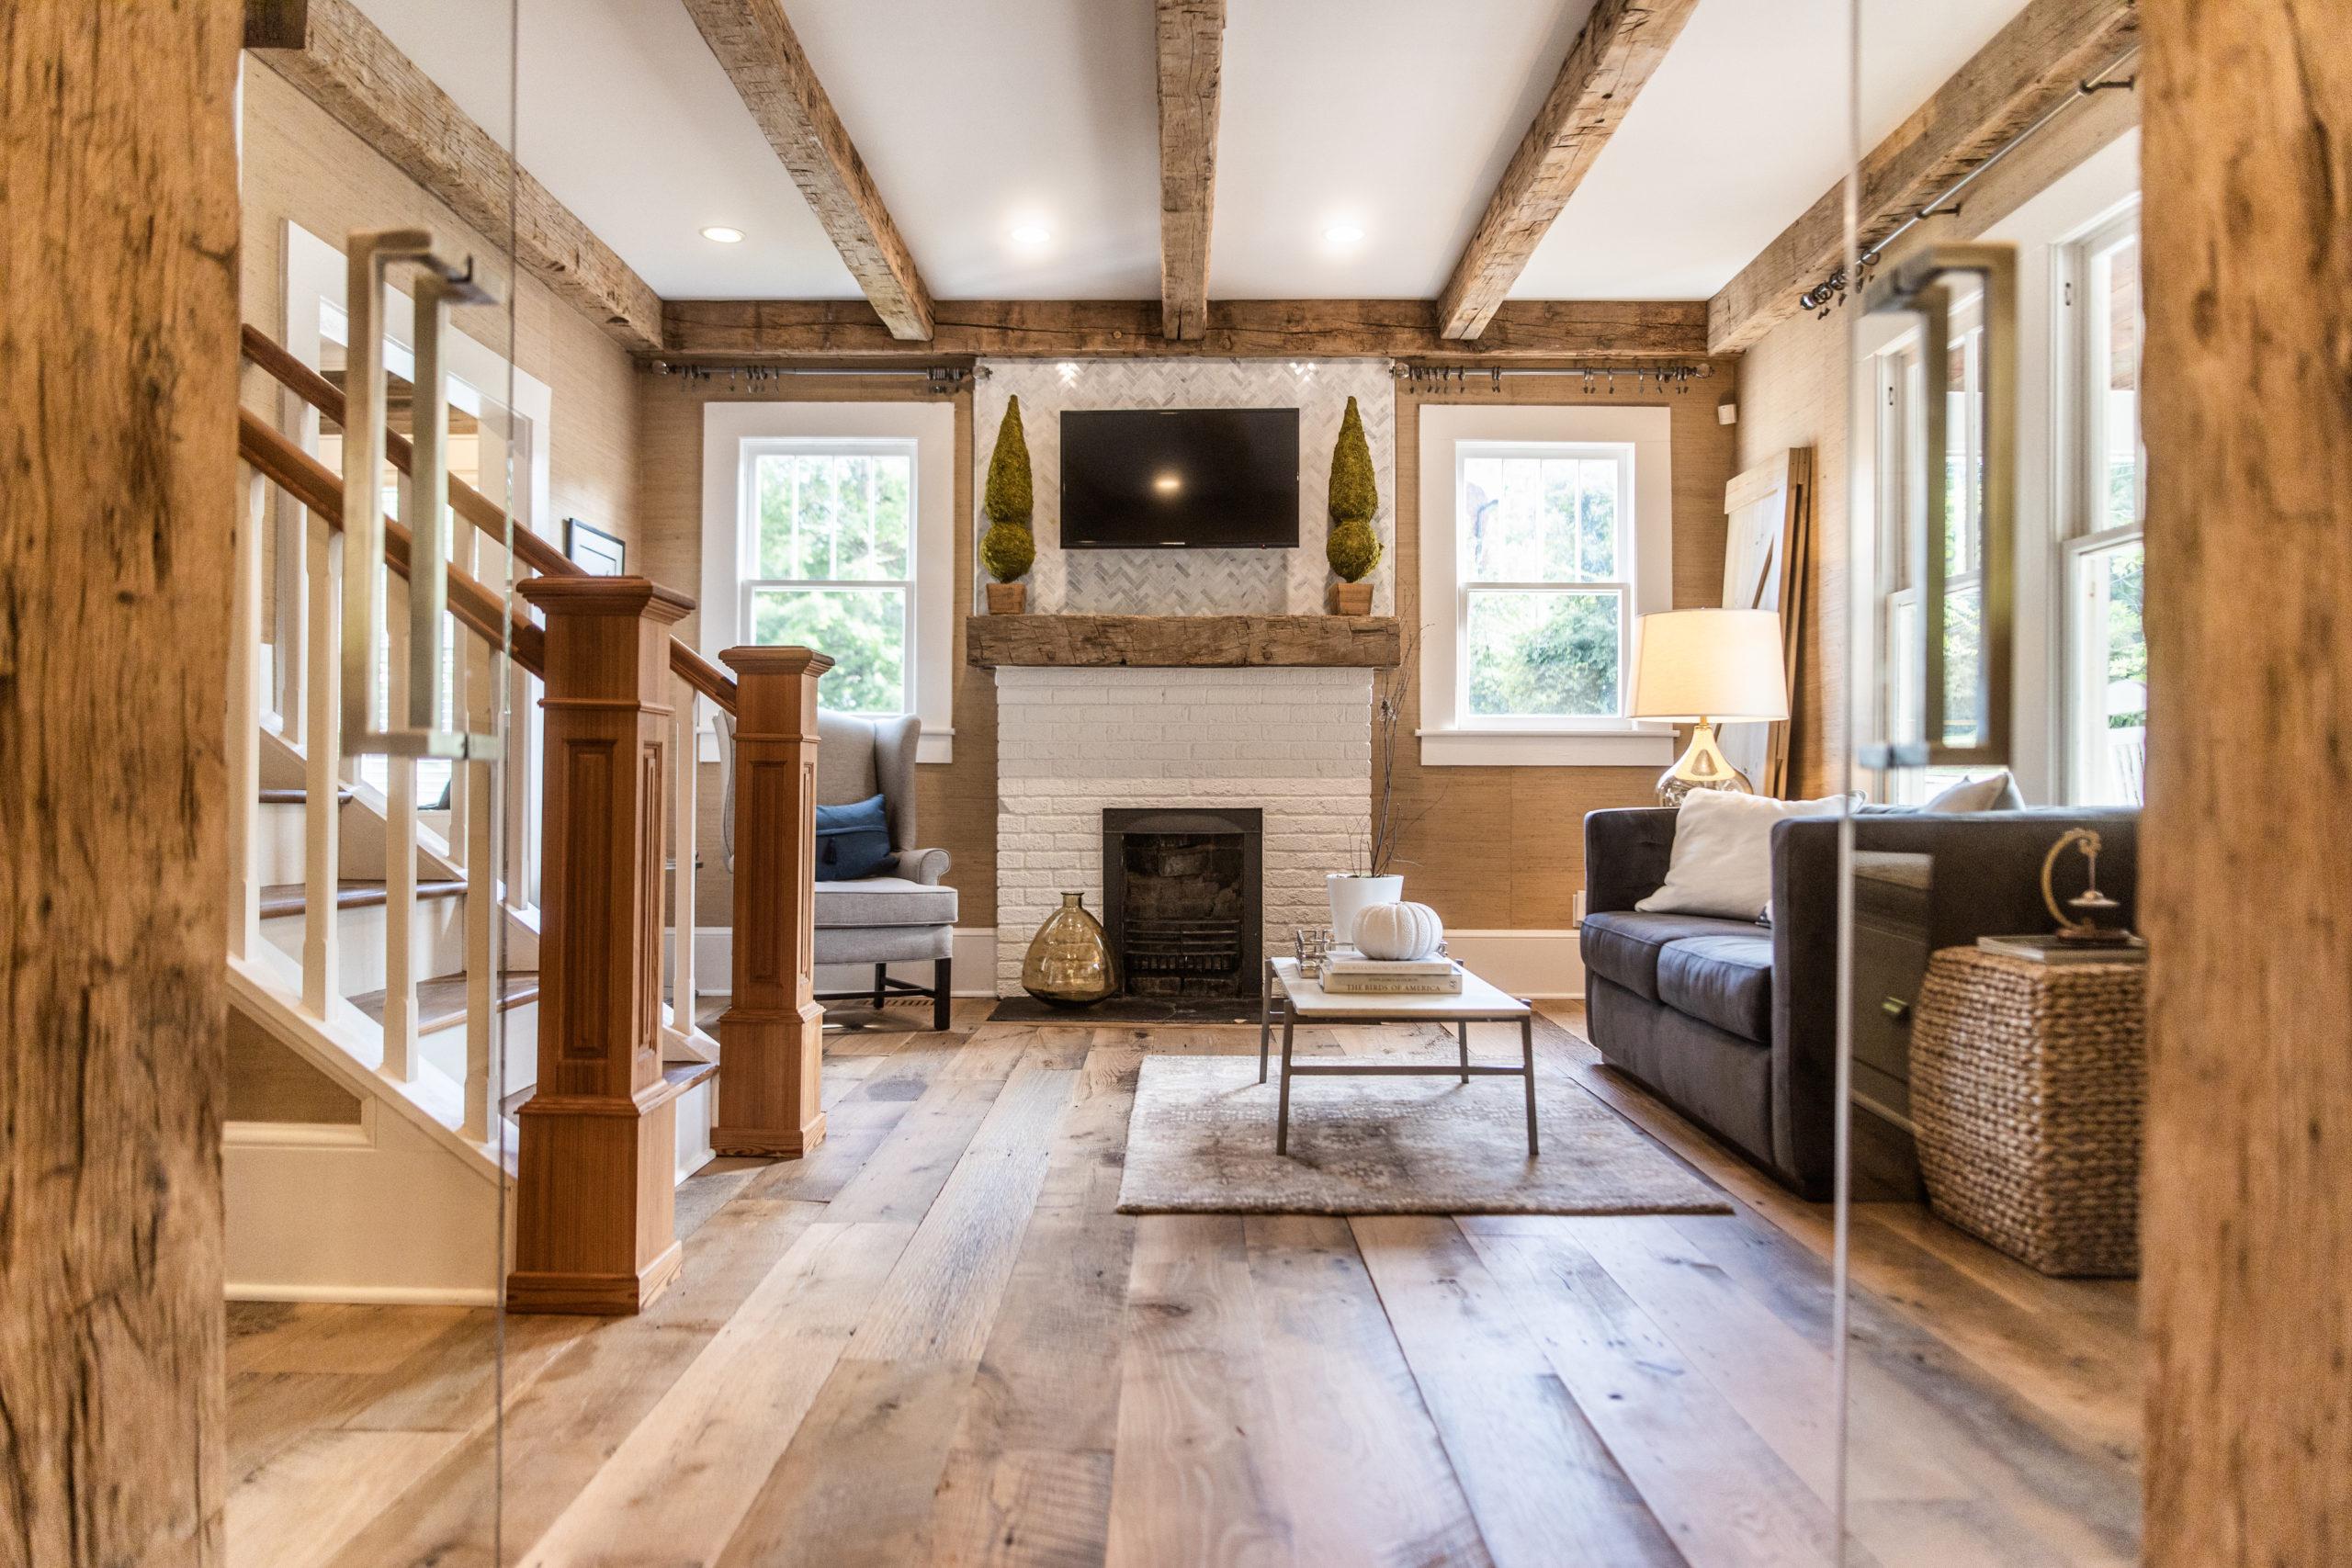 Original Face Skip Planed Antique Reclaimed White Oak Flooring, Antique Reclaimed Hand Hewn Beams + Mantel